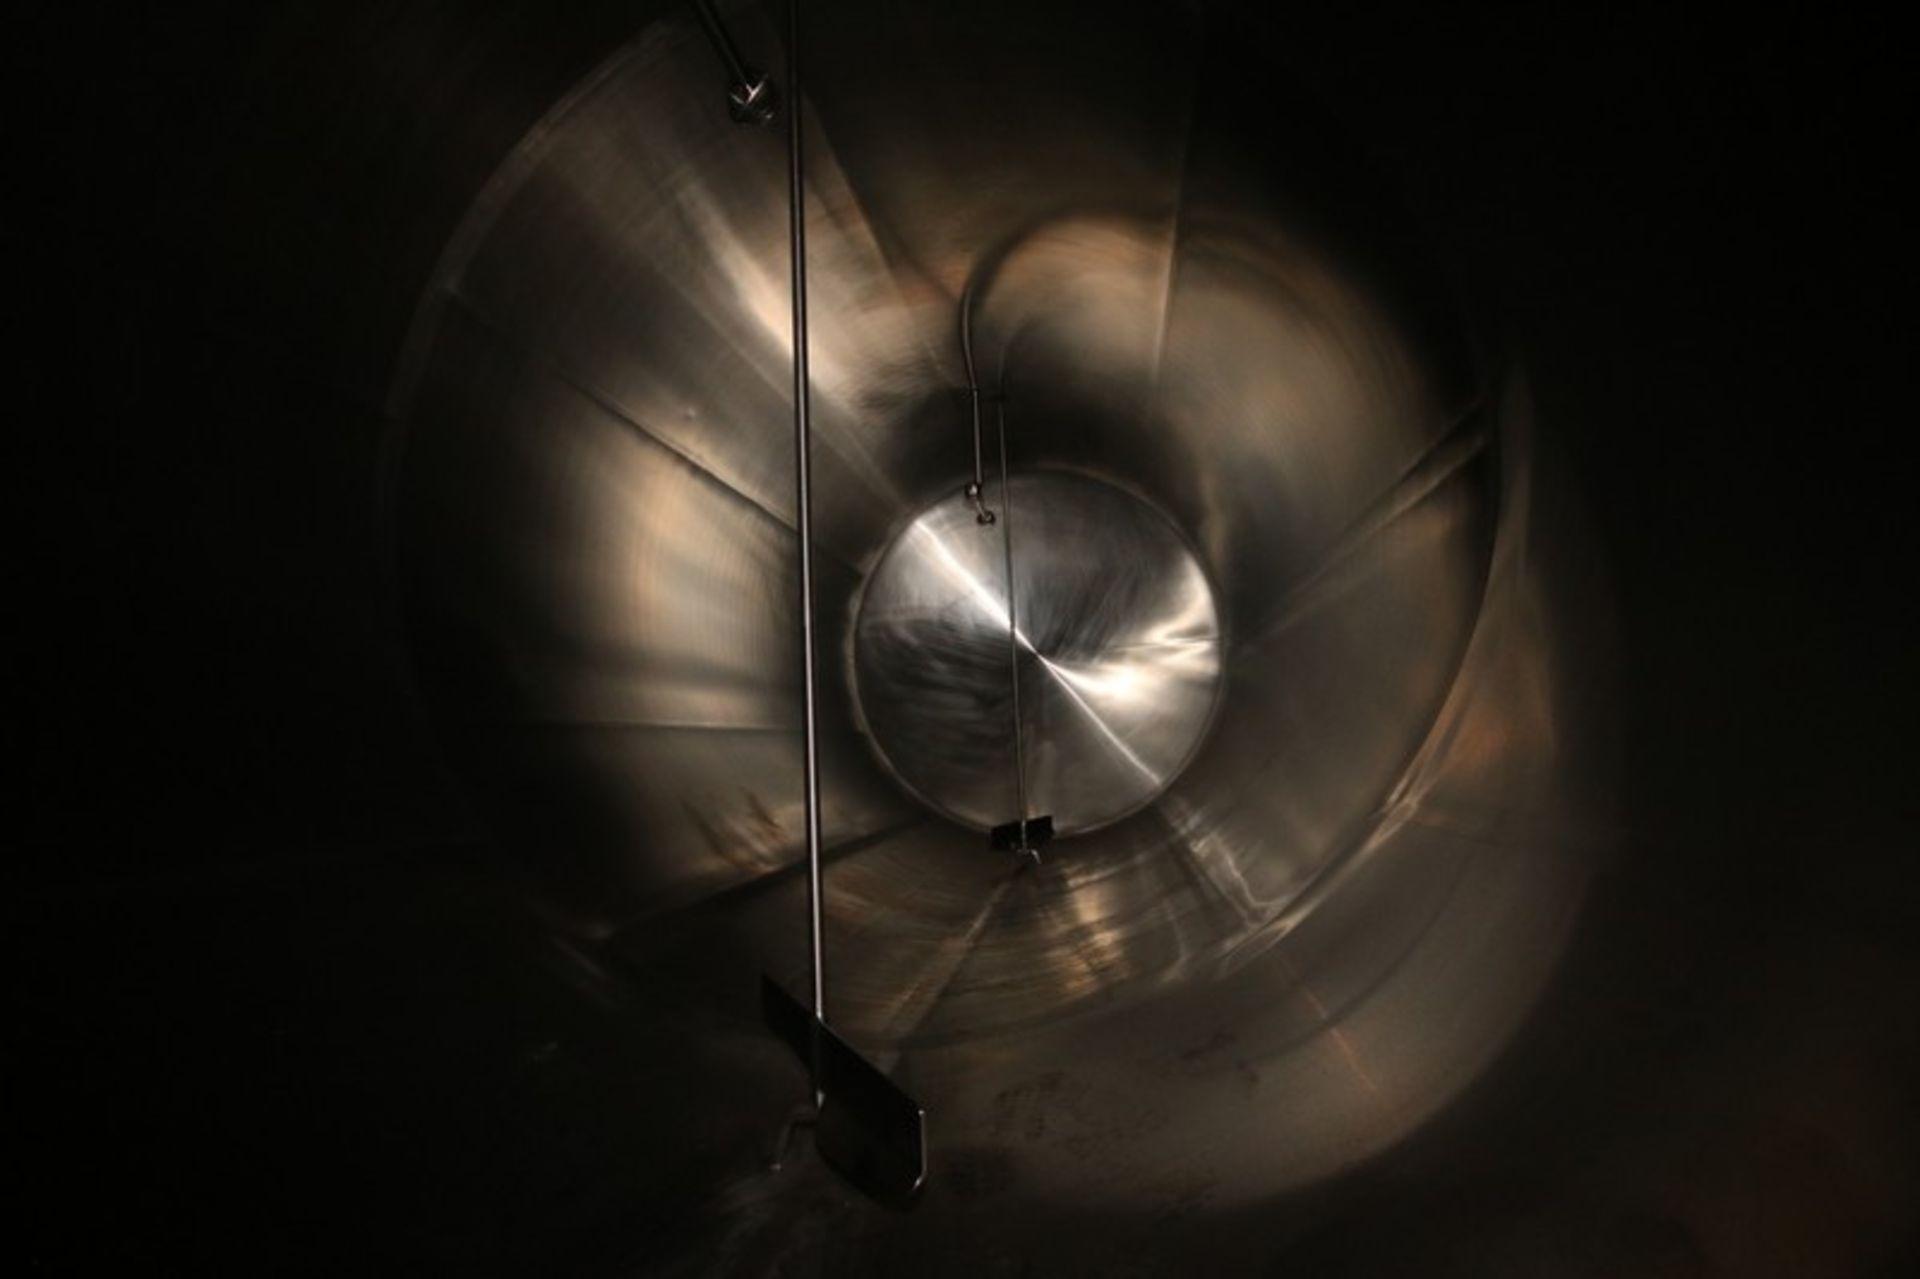 "Walker Aprox. 9,500 Gal. S/S Horizontal Tank, S/N 1520, Tank Dims.: Aprox. 108"" Diameter x 20' Long, - Image 5 of 7"